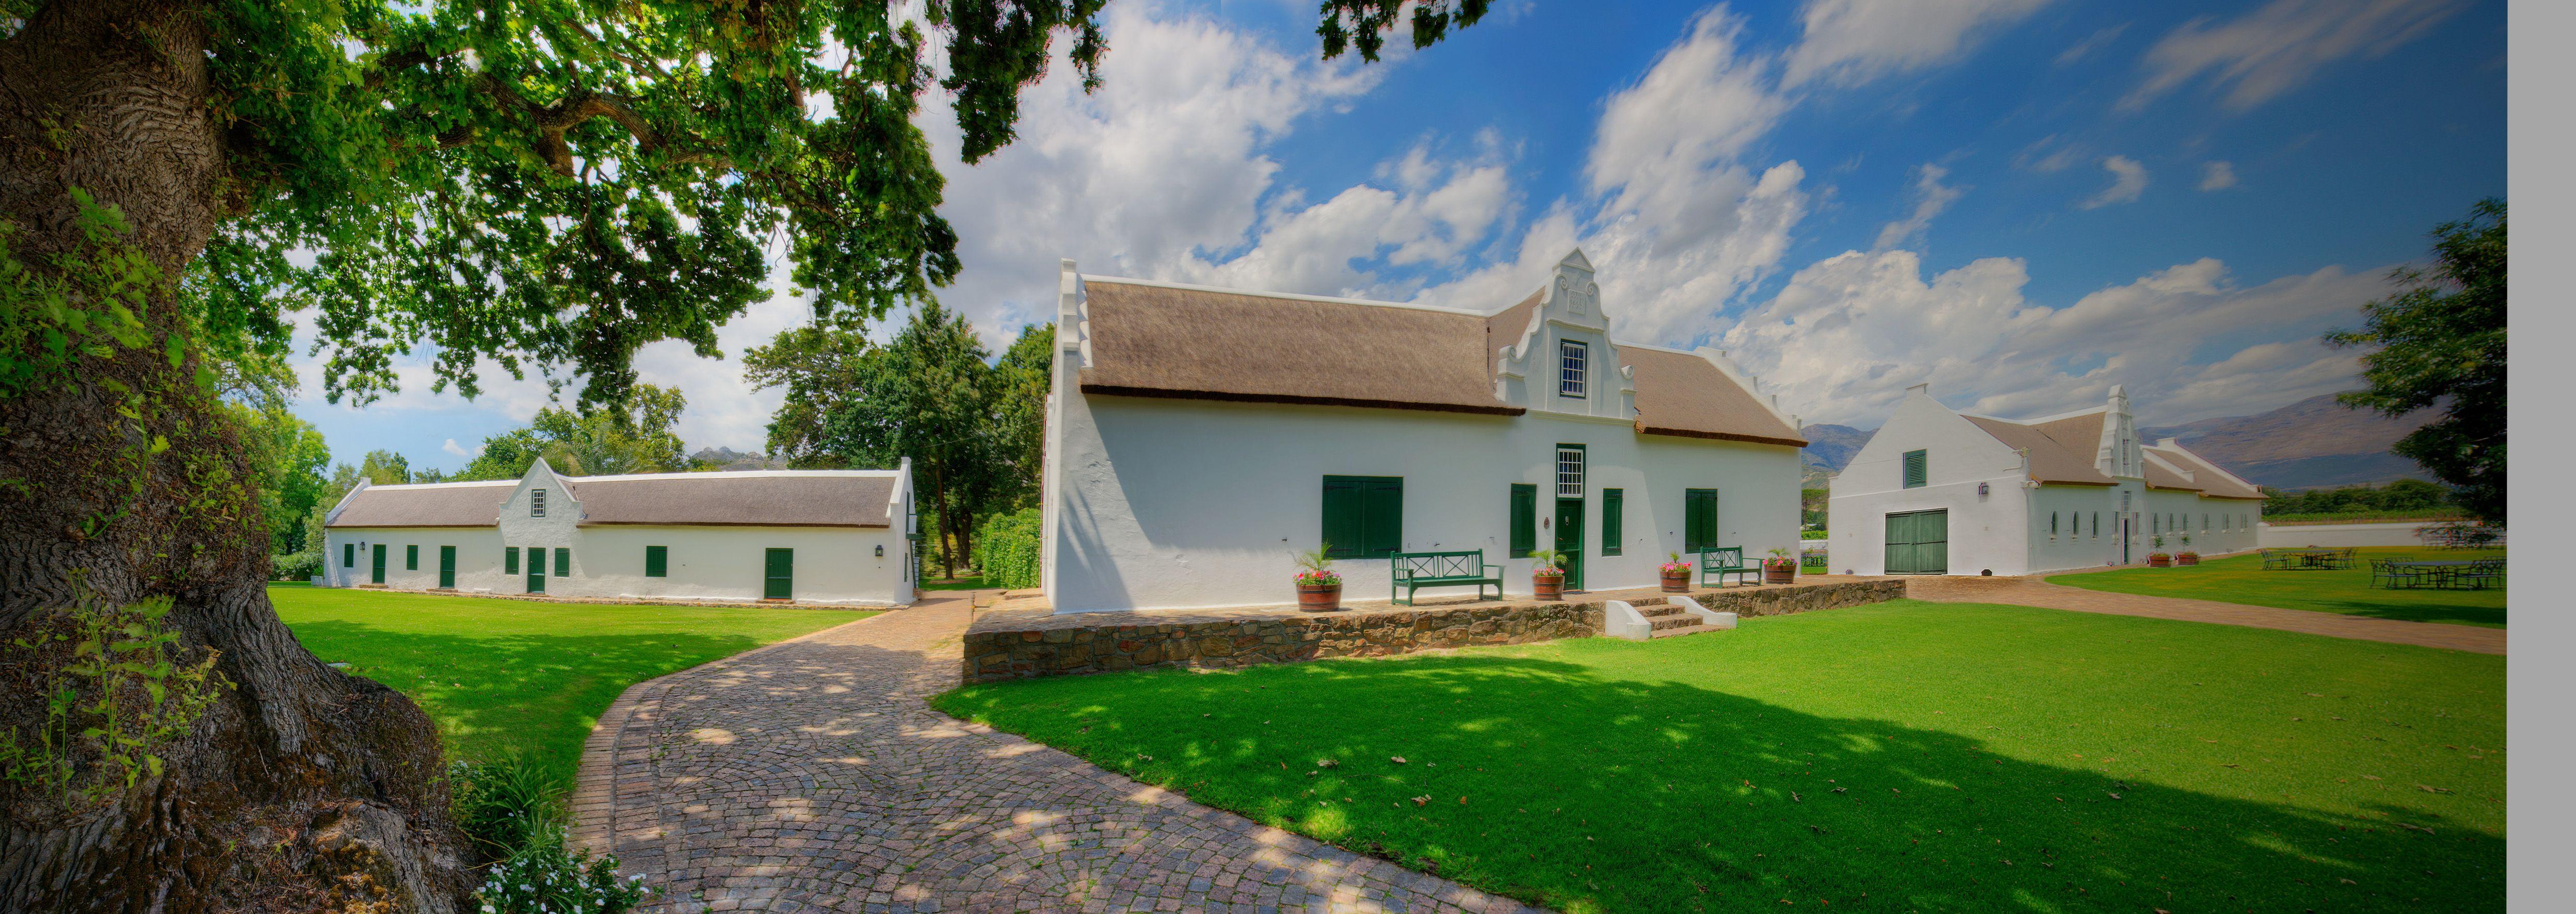 La Motte Jonkershuis Manor House Historic Cellar Lamotte Wine Franschhoek History Art